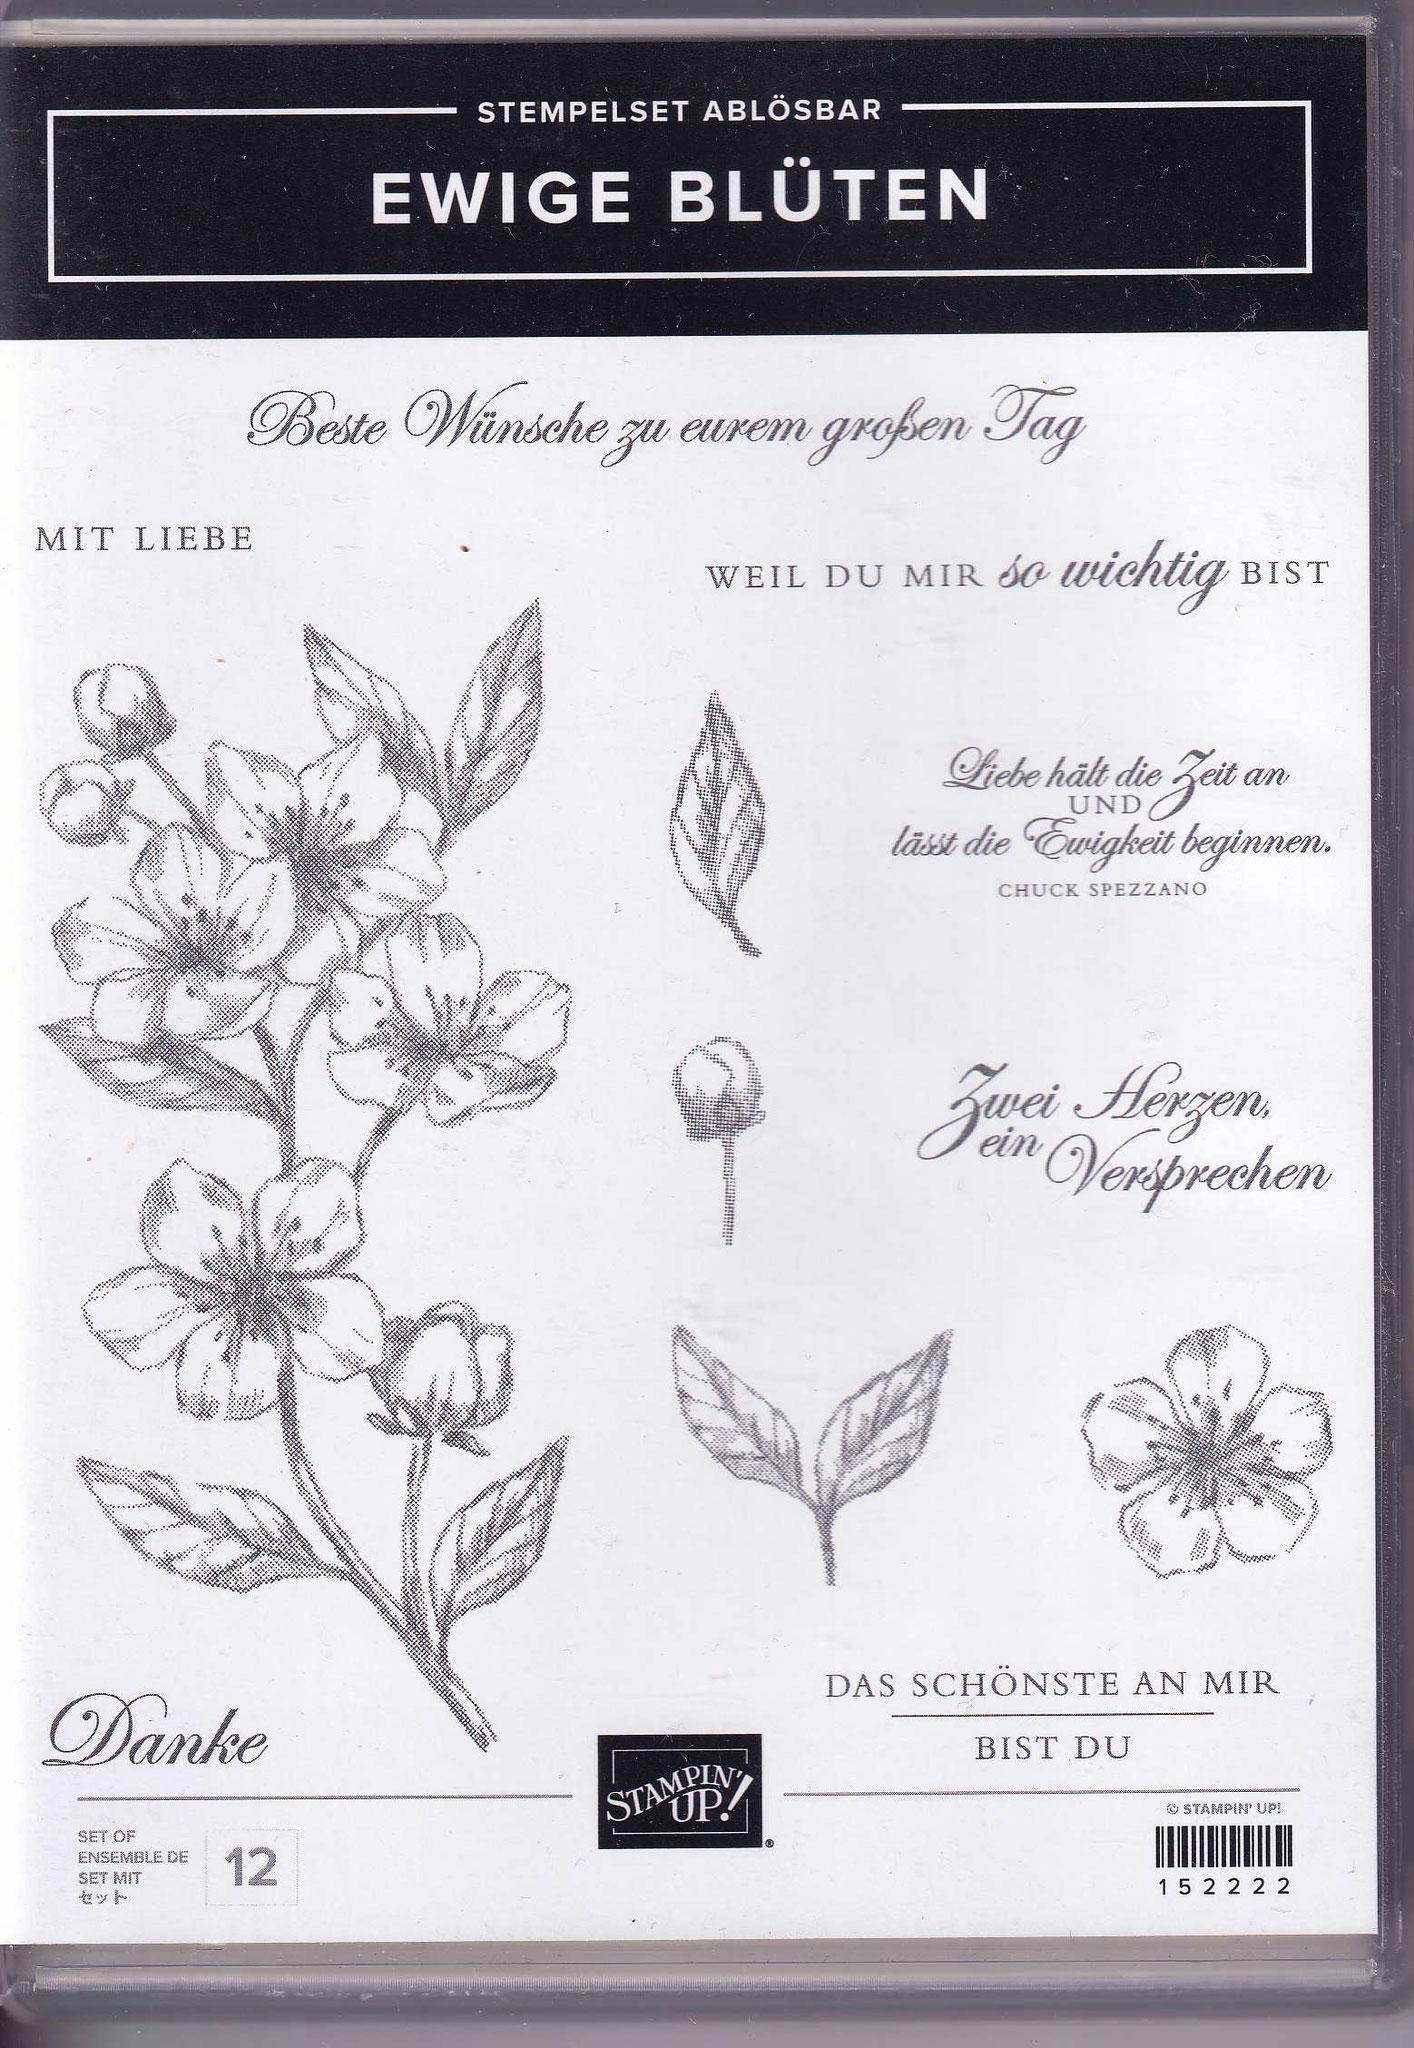 Ewige Blüten